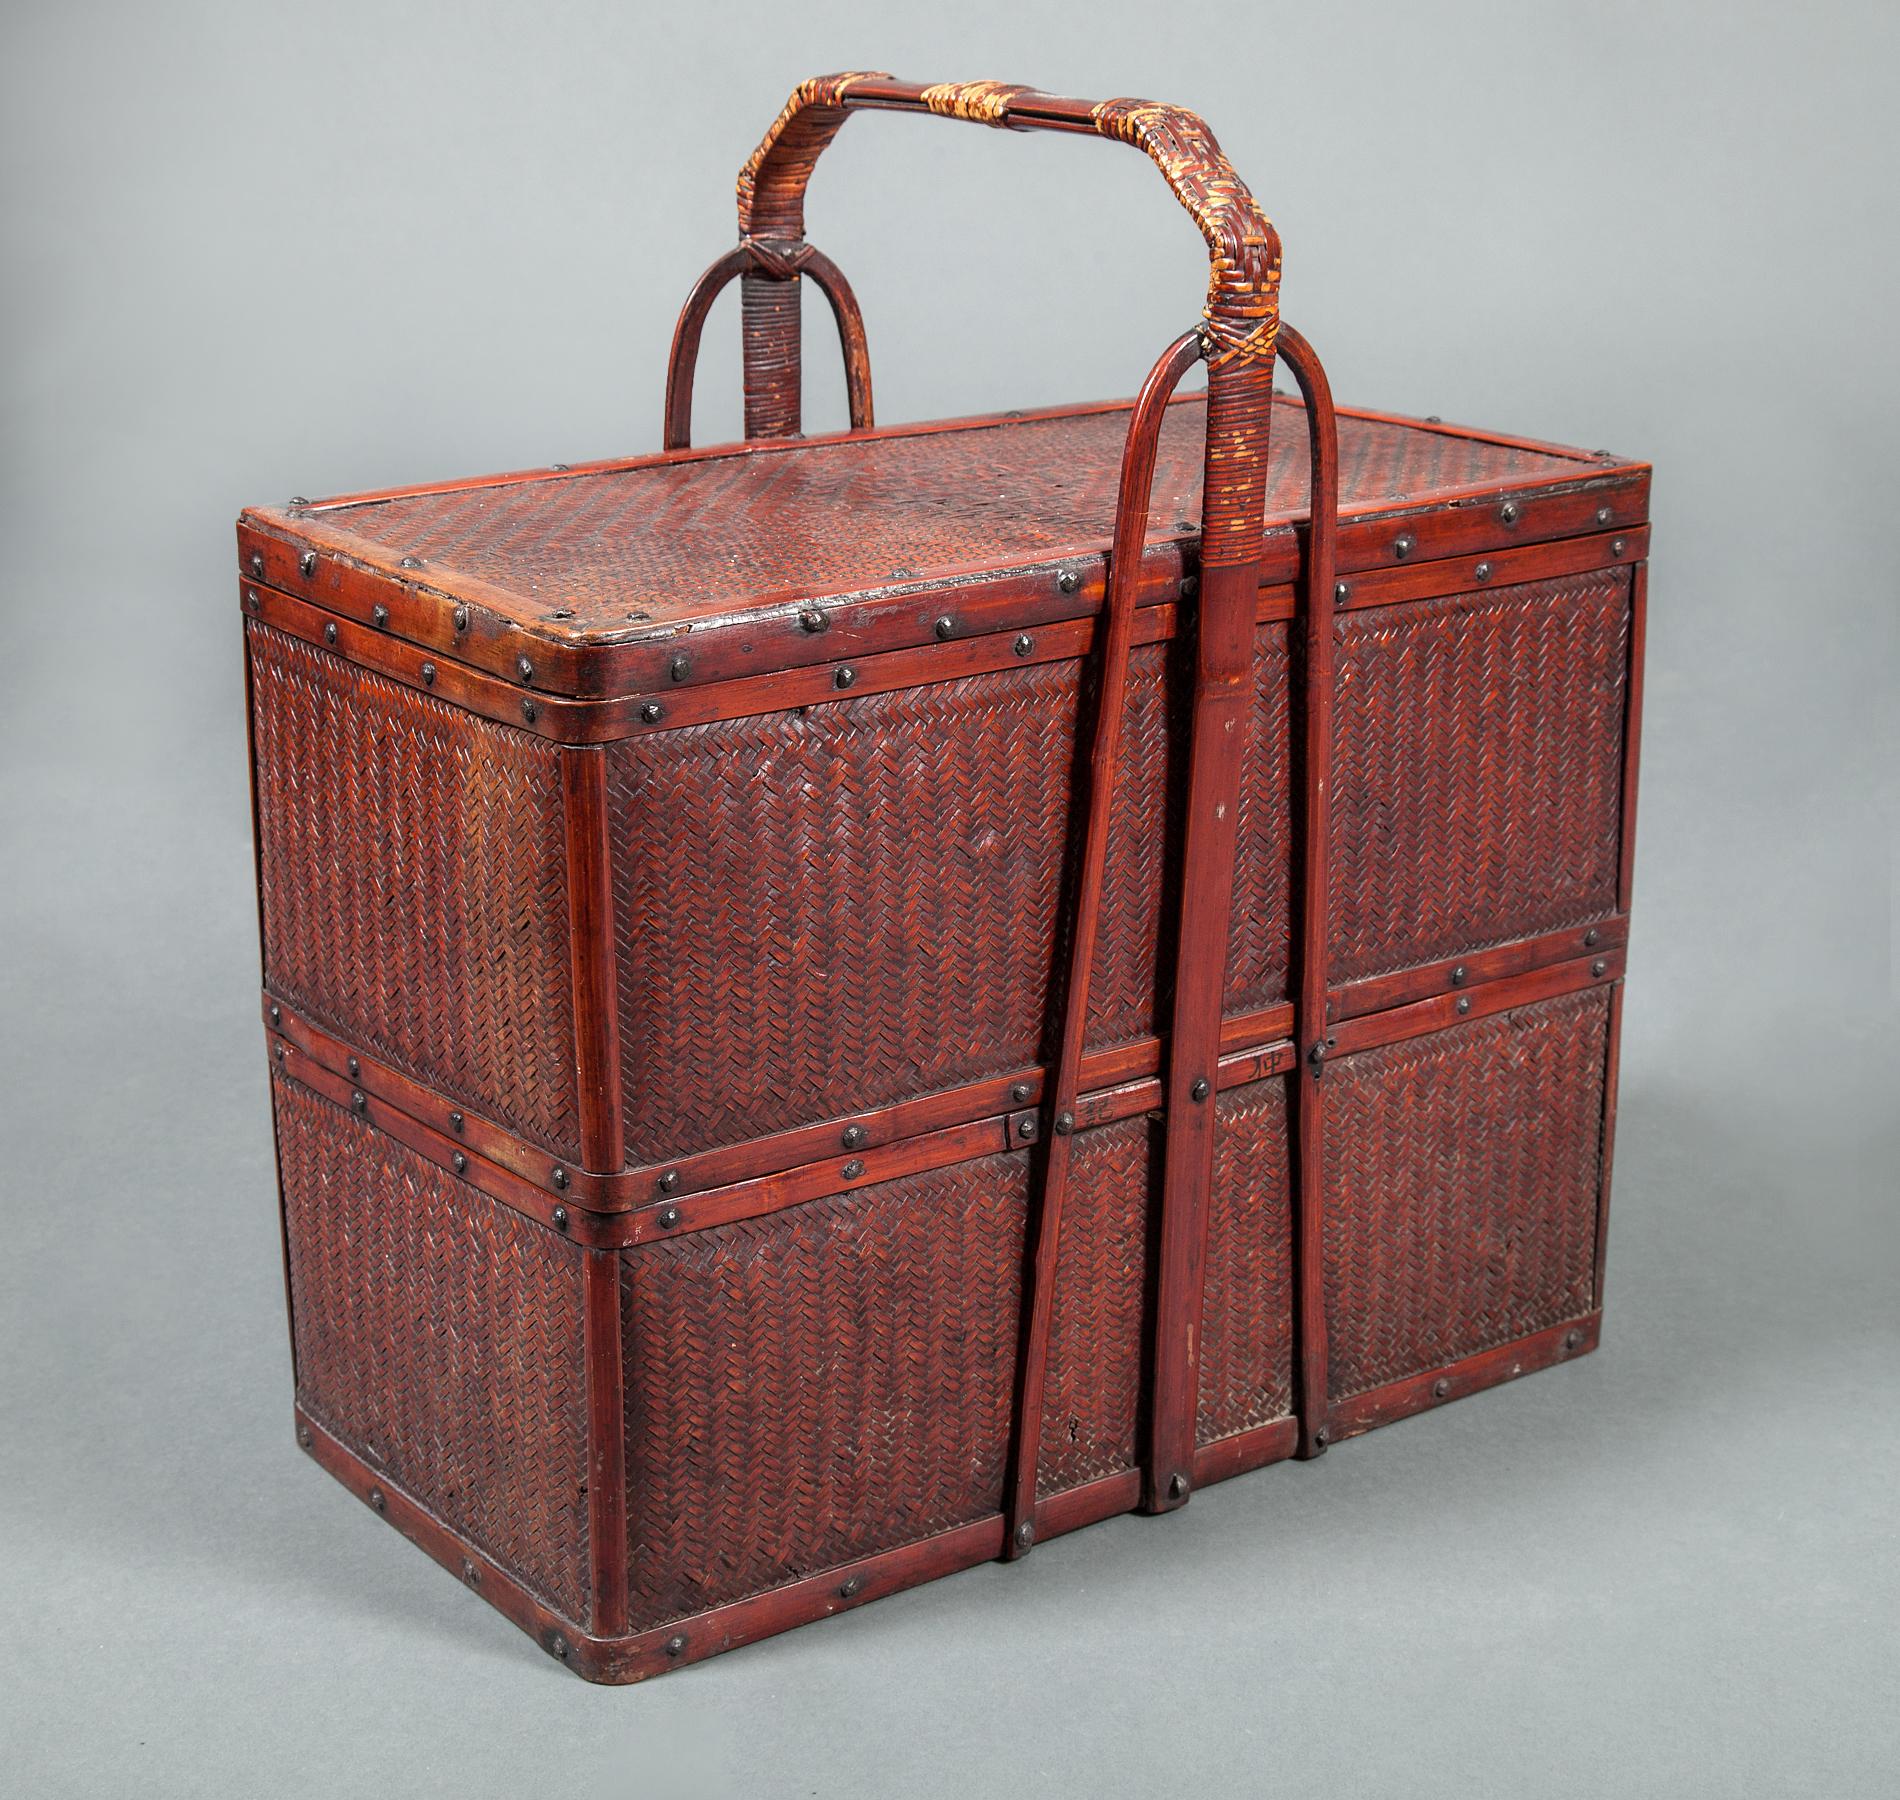 Dual Chamber Bento (Food Carrying Box) Basket